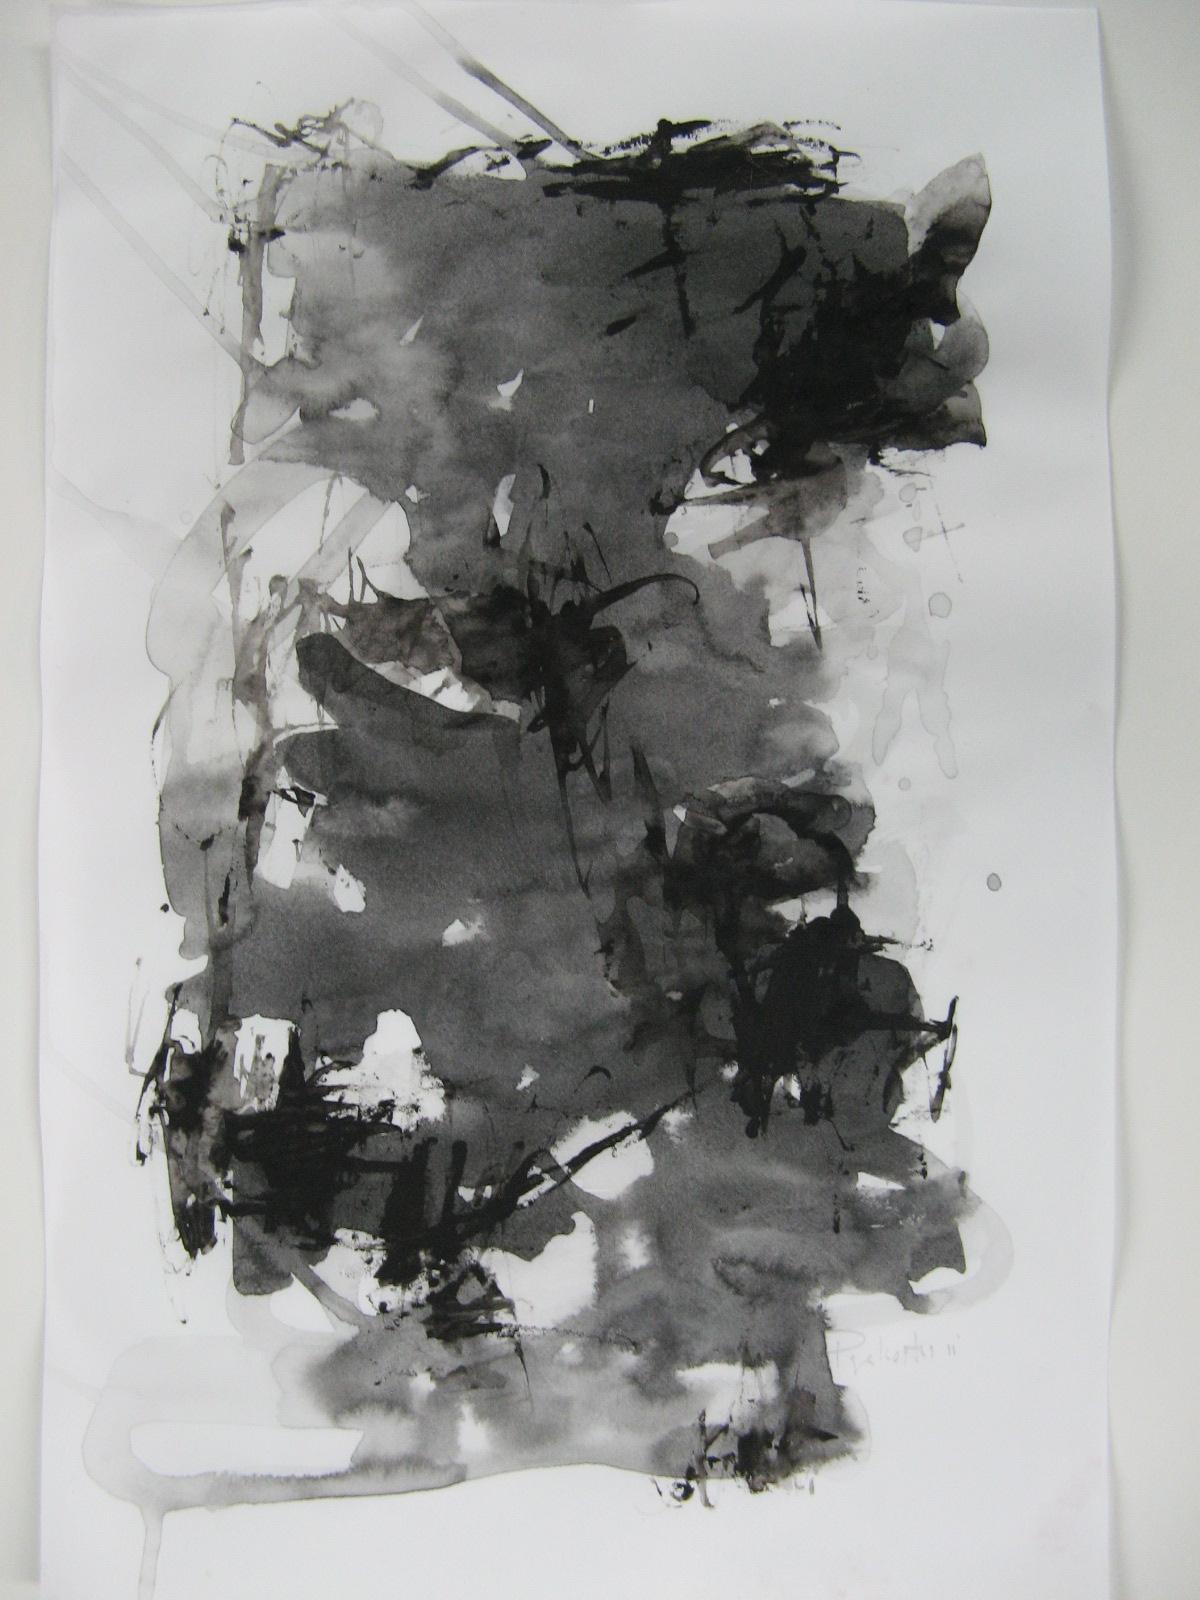 2011 ink on paper, 43.18 x 27.94cm (17 x 11in.) - IMG_1945.JPG